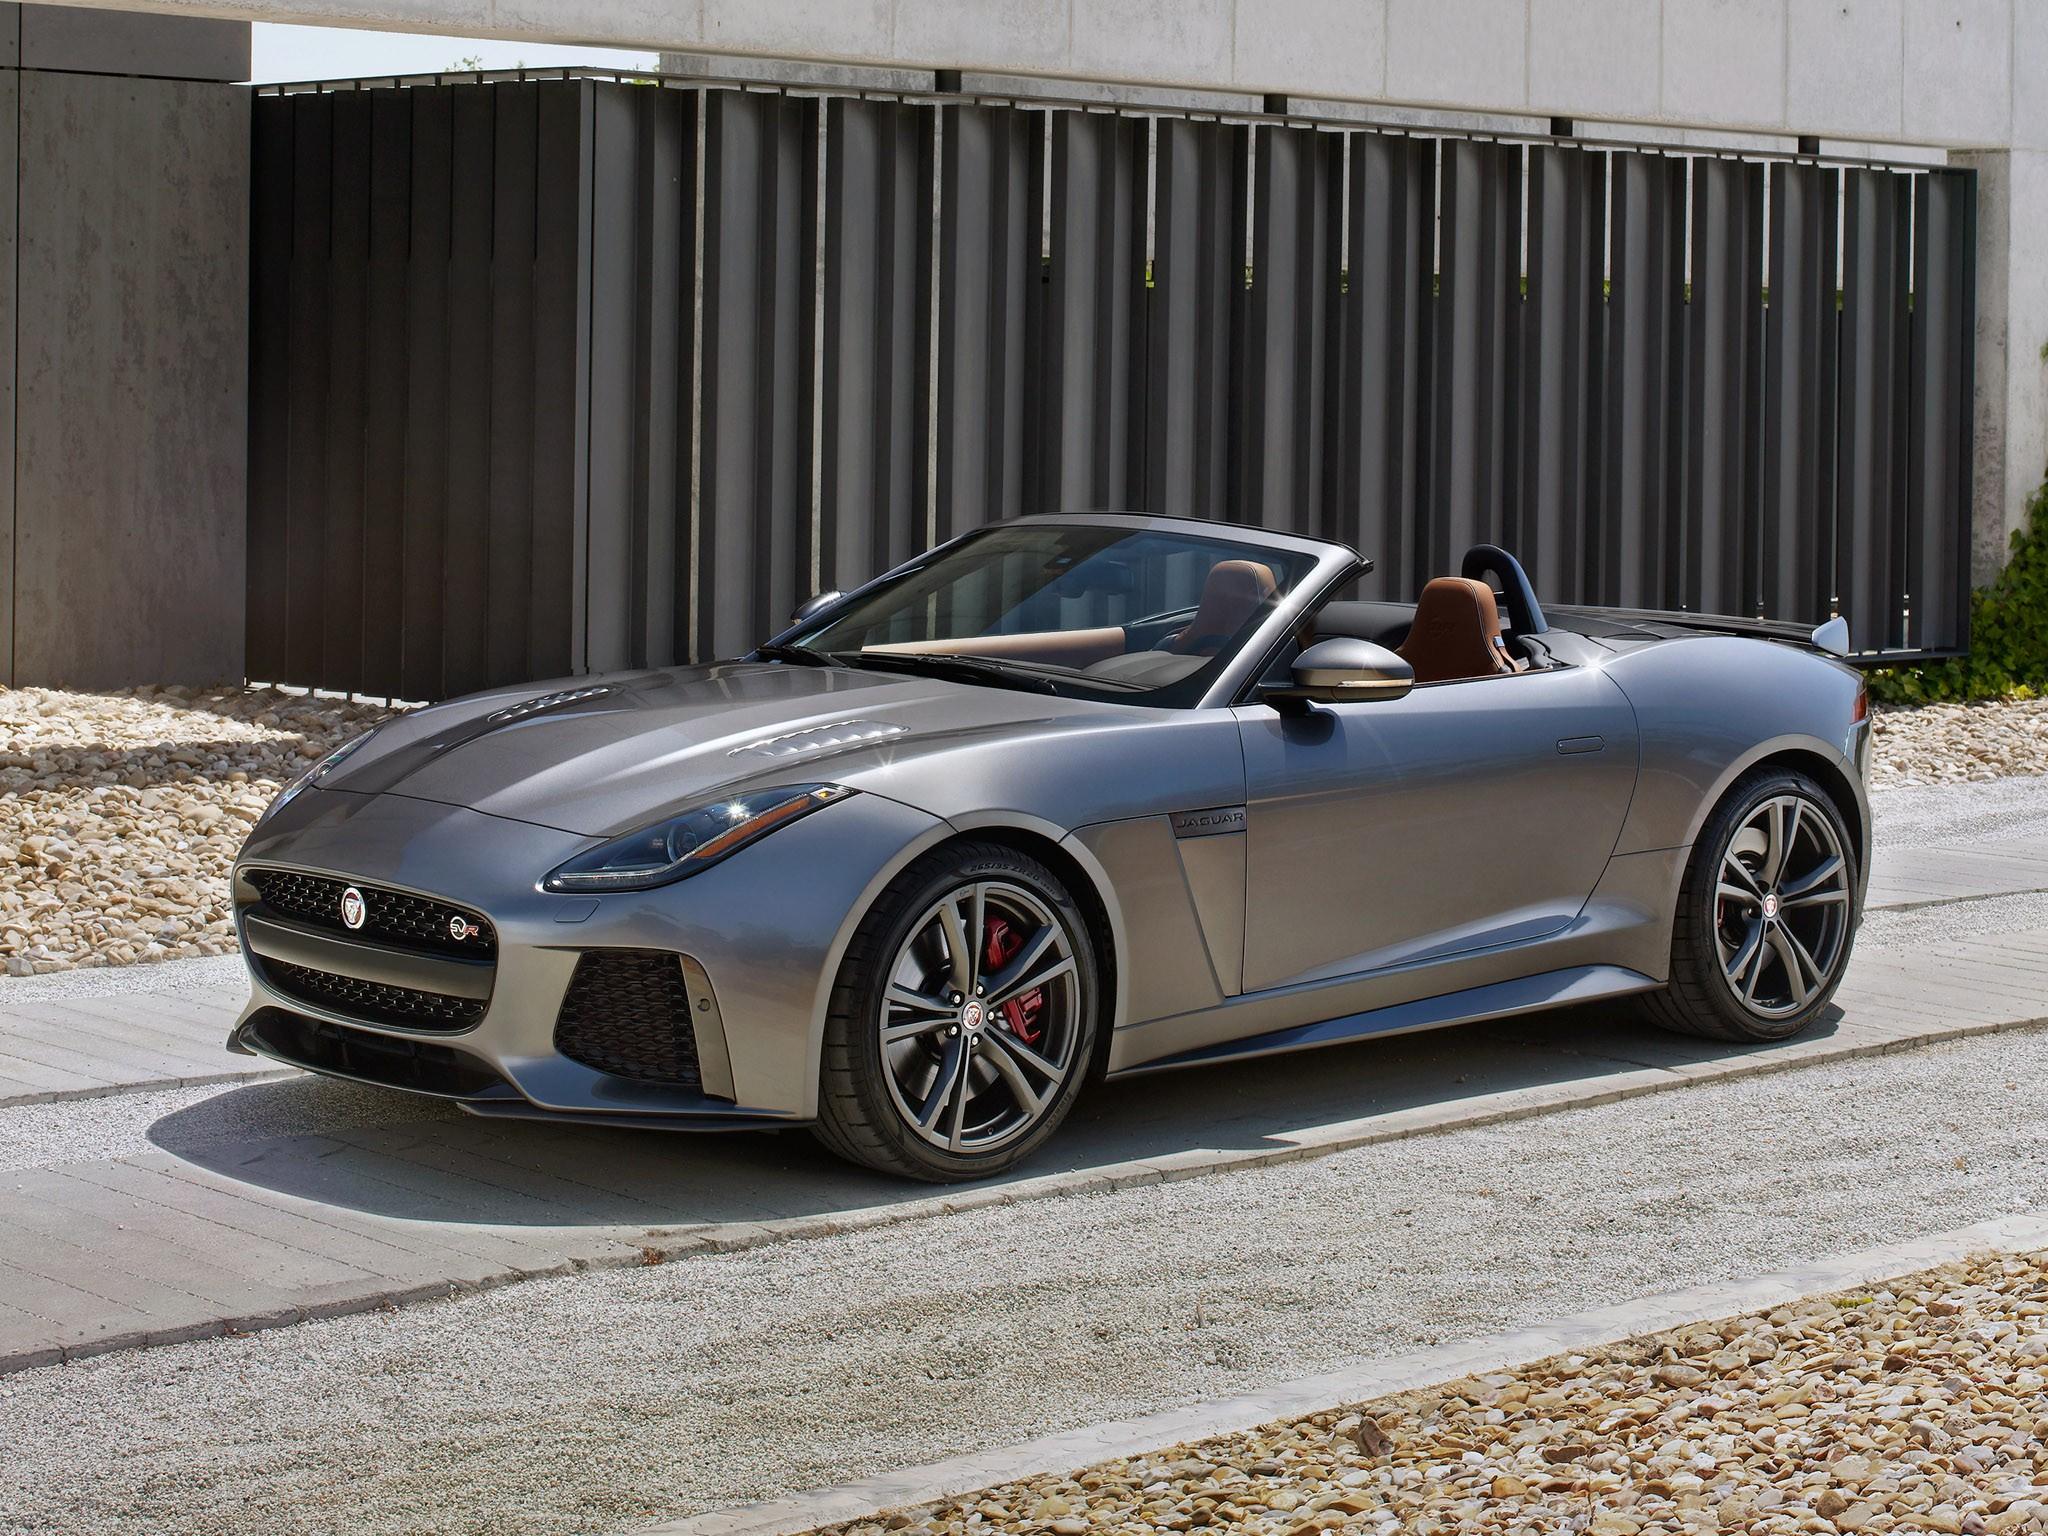 2016 Jaguar F-Type SVR Convertible